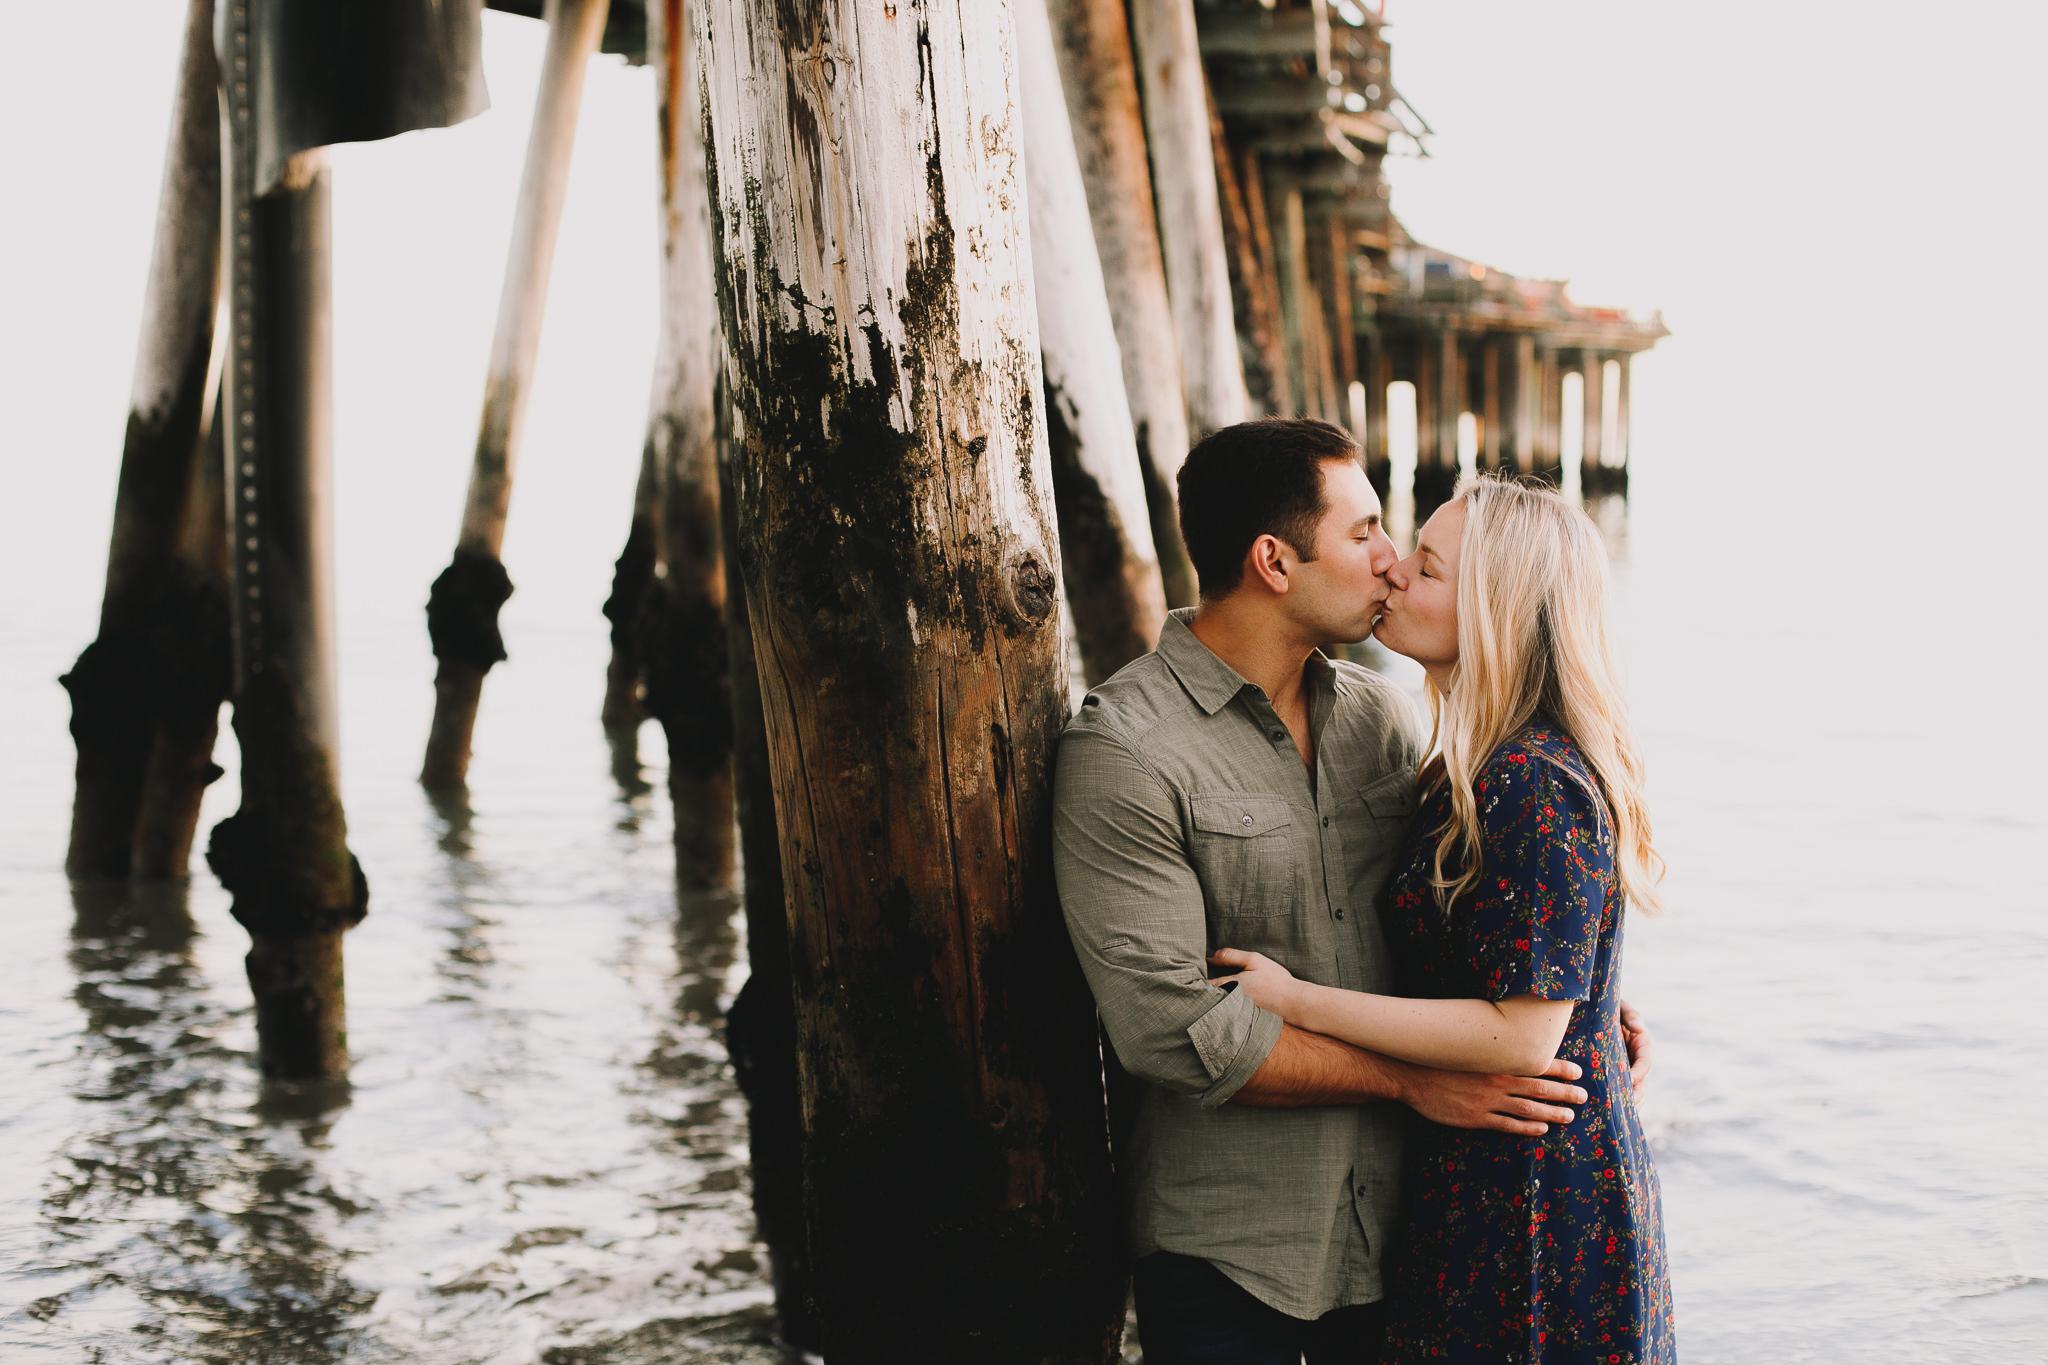 Archer Inspired Photography Capitola Beach Santa Cruz Wedding Engagement Lifestyle Session Photographer-134.jpg